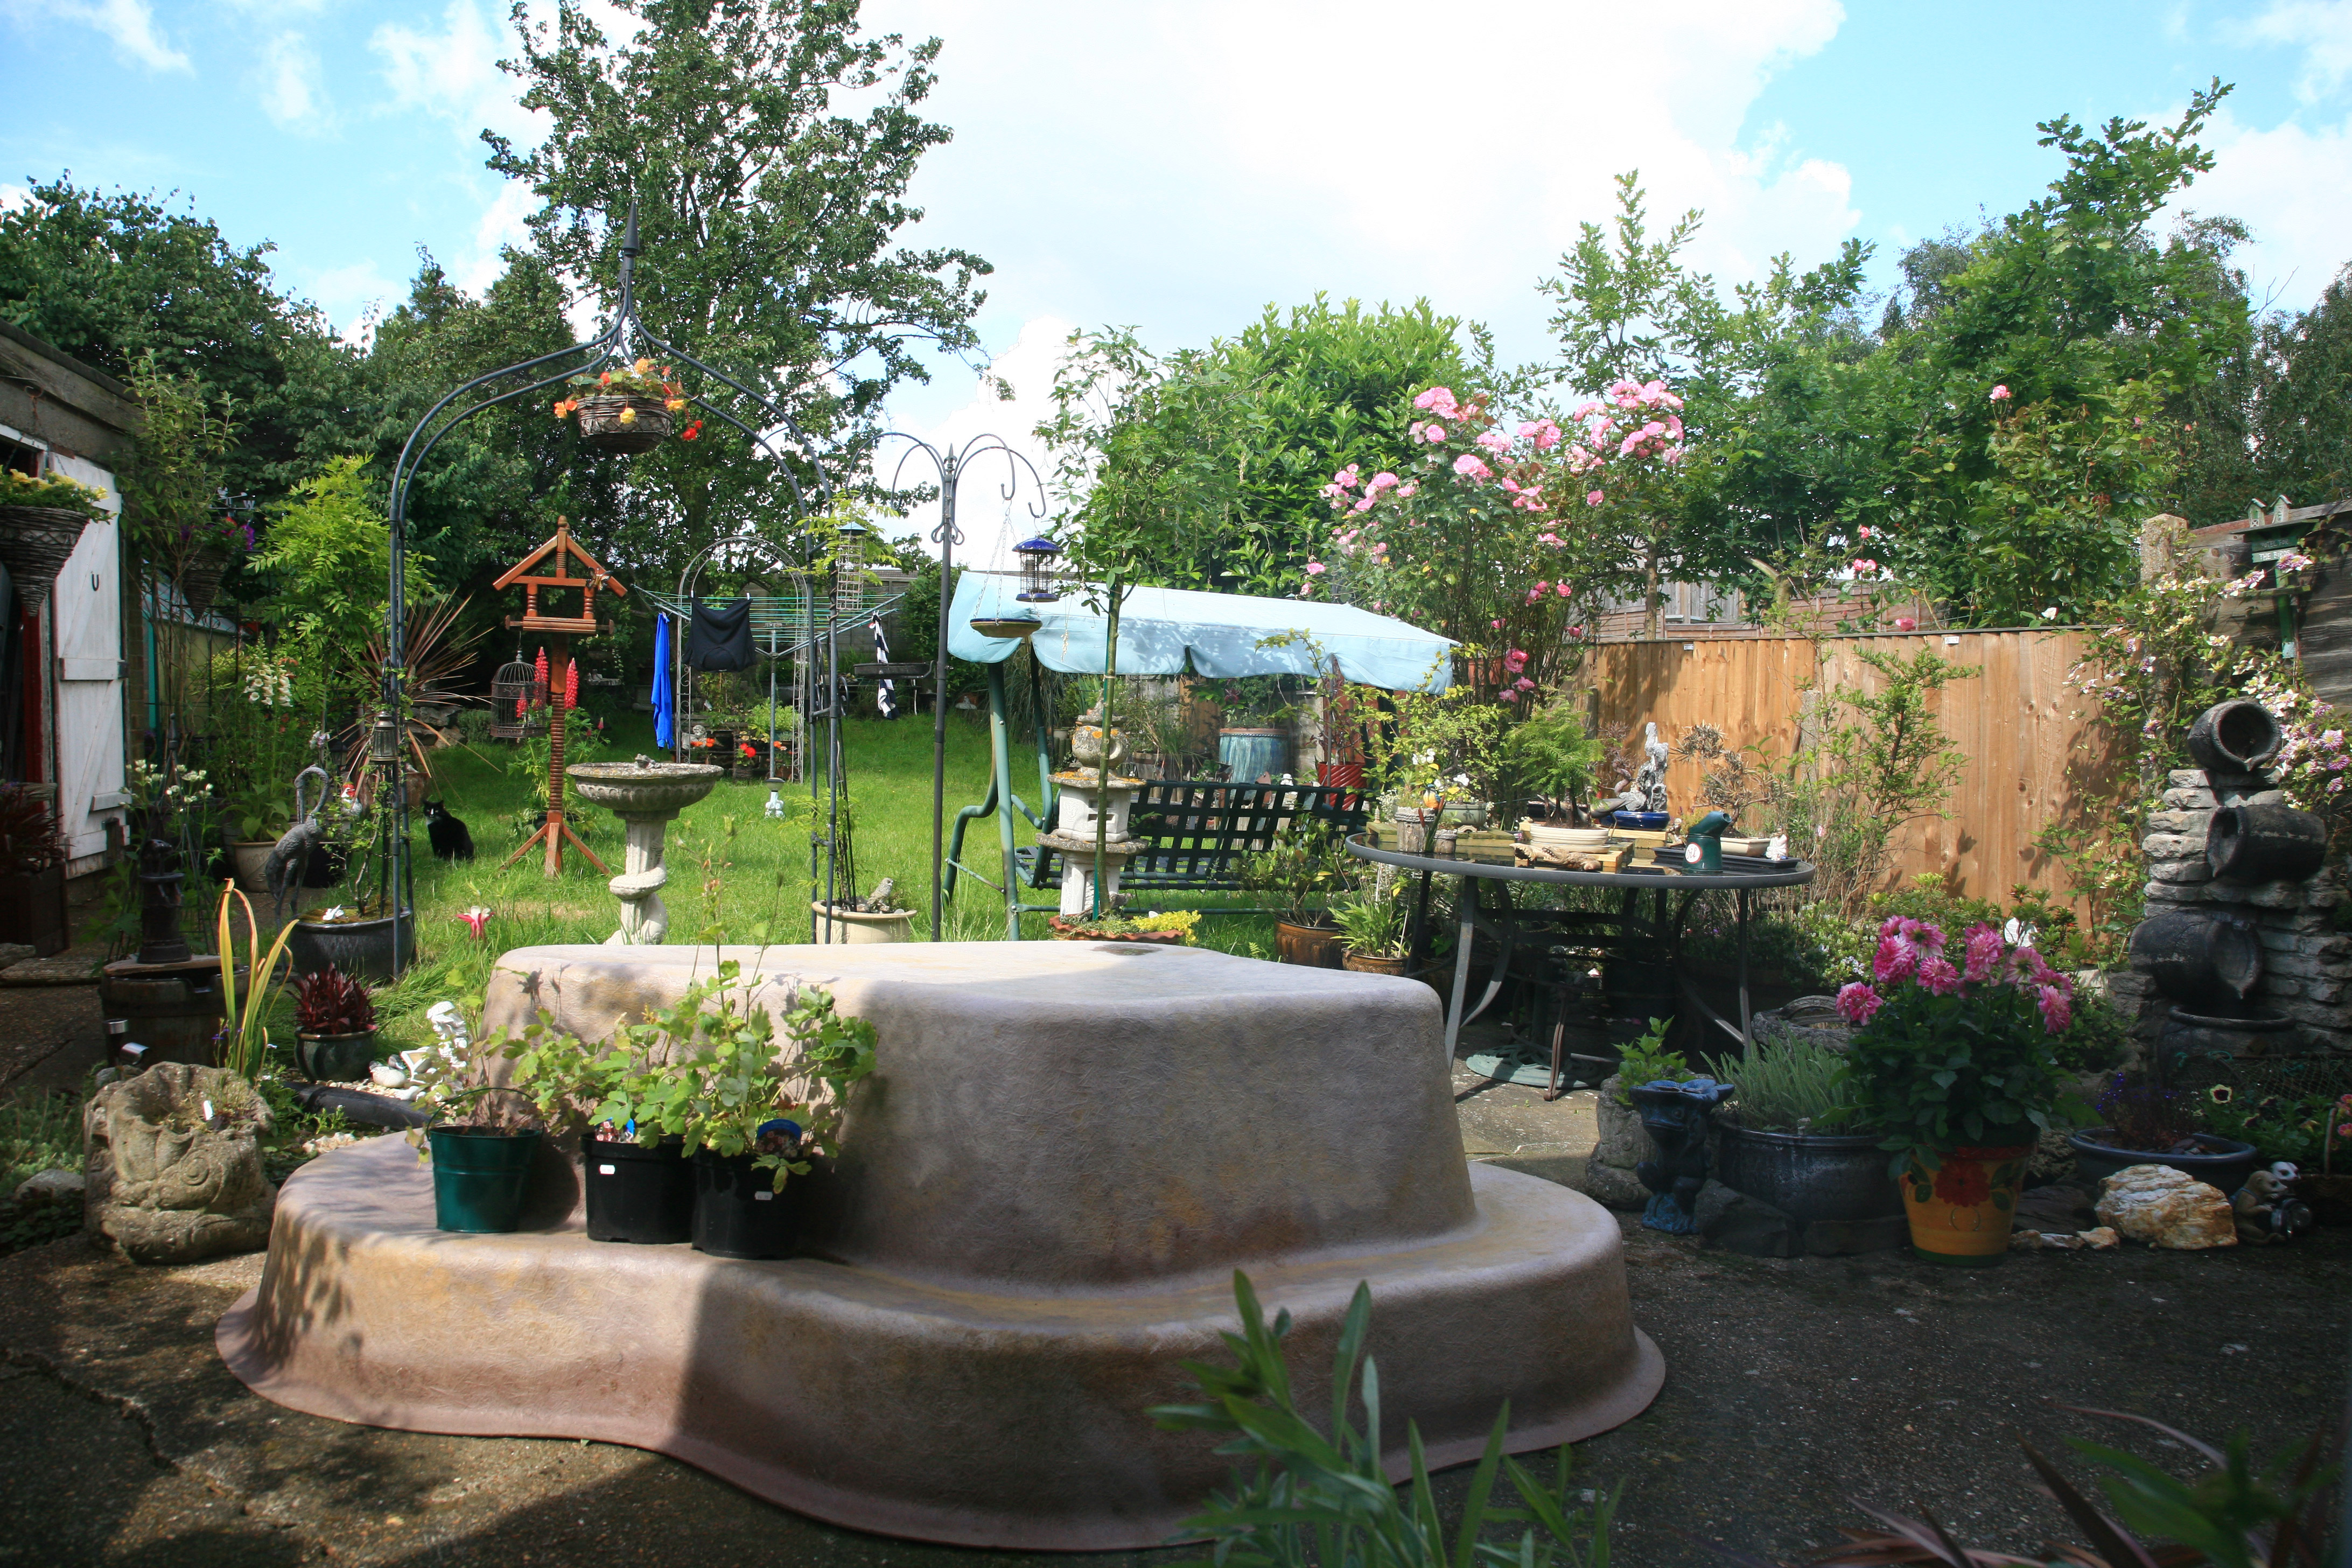 MaJiKs Garden